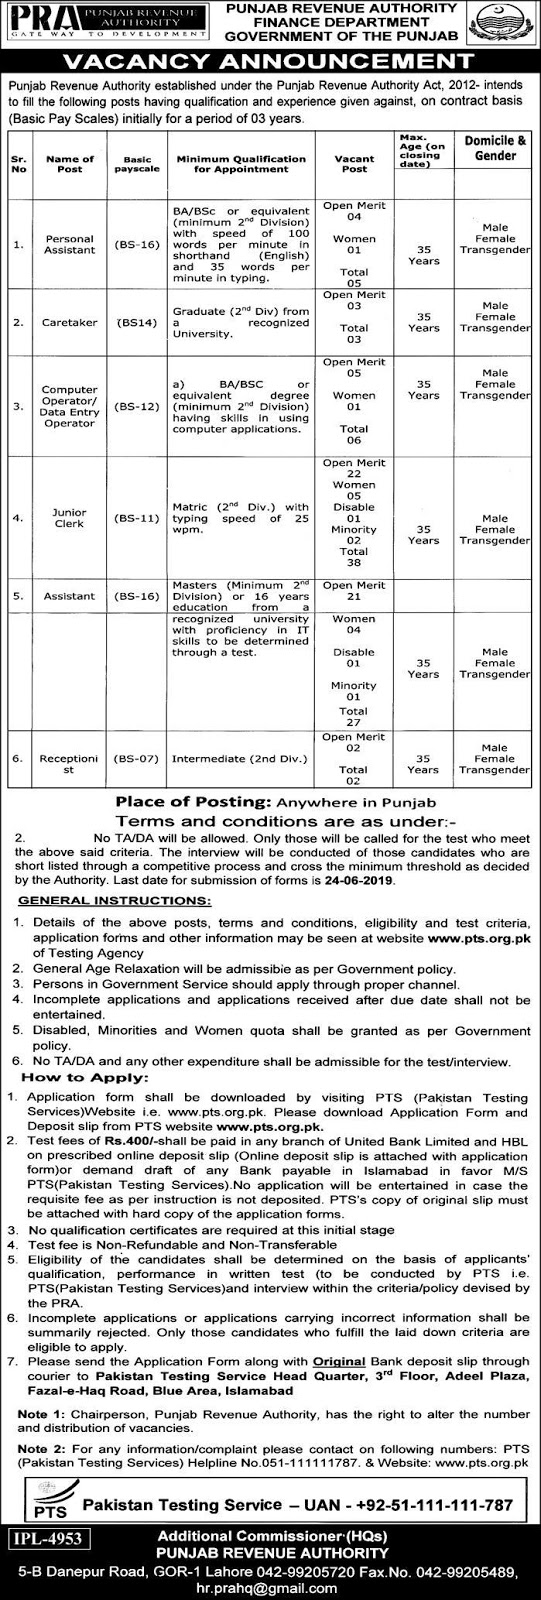 Advertisement for Punjab Revenue Authority Jobs